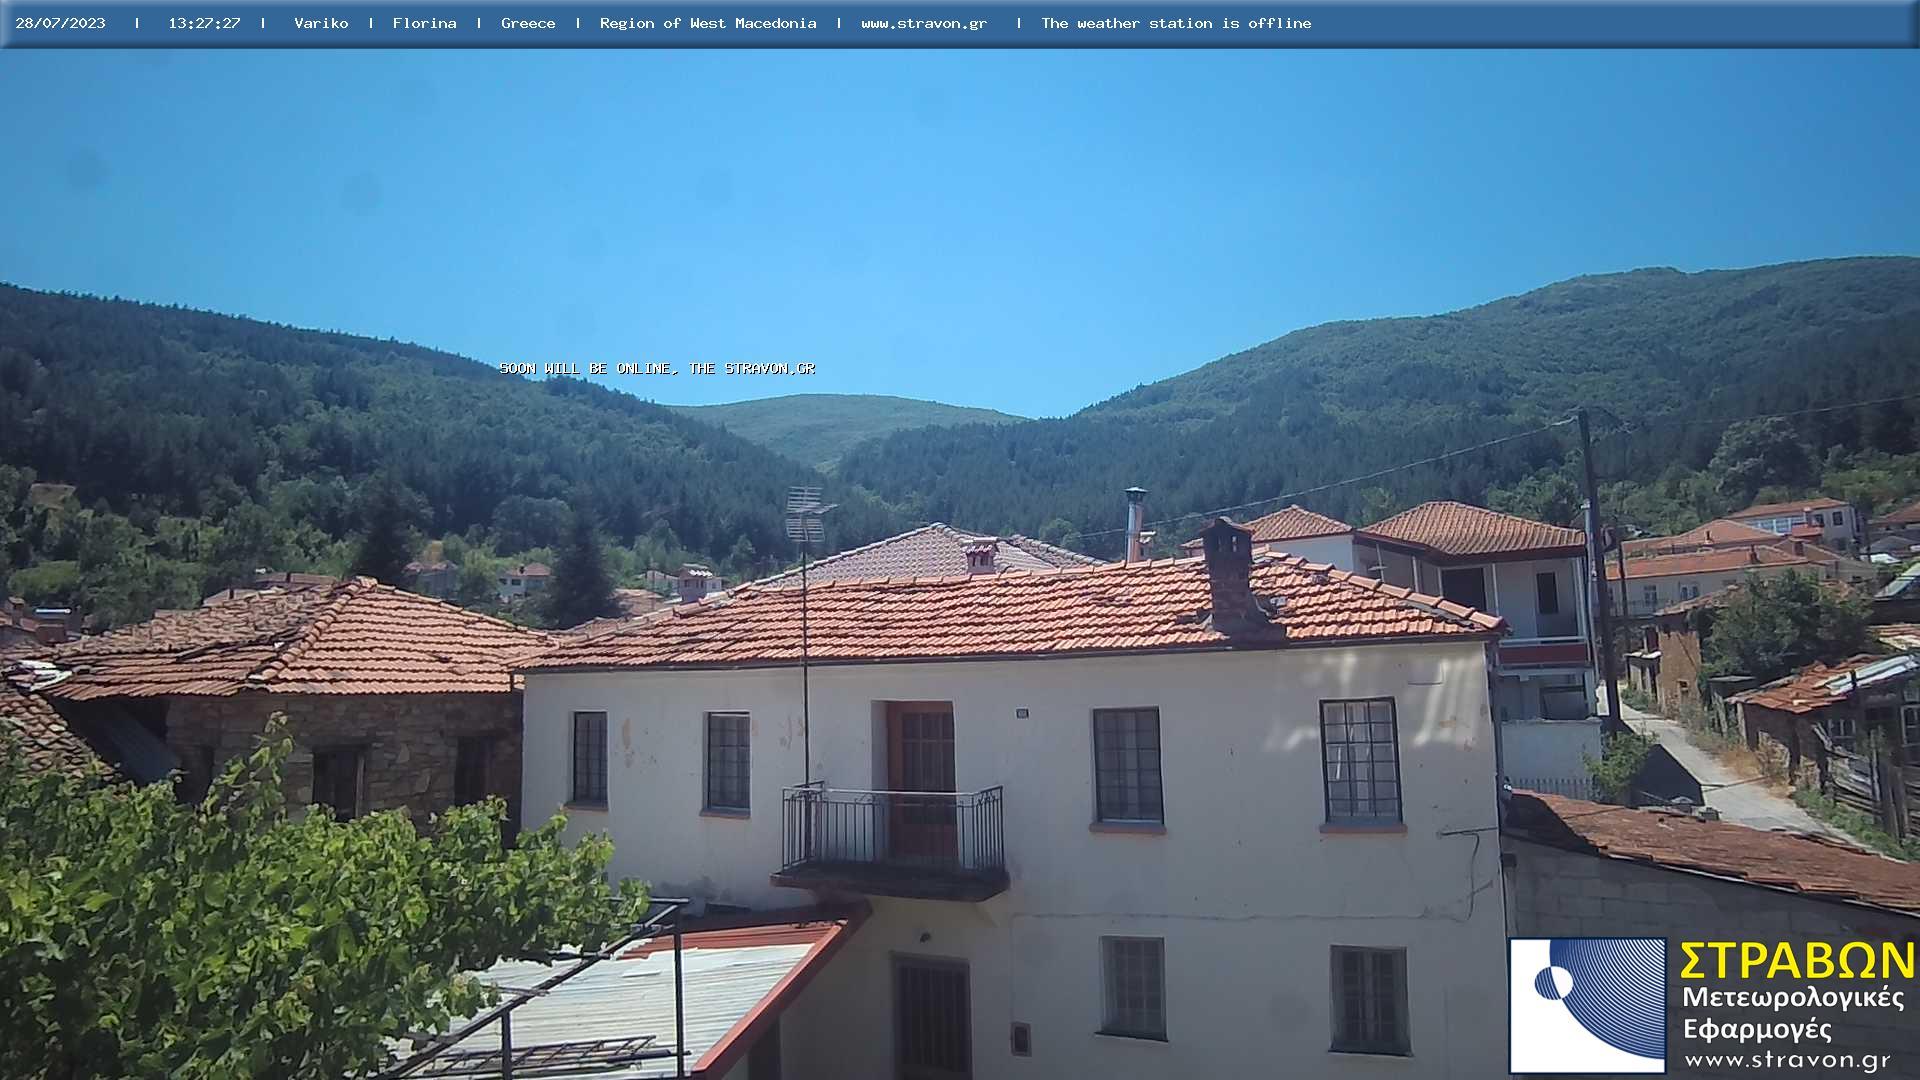 http://www.stravon.gr/meteocams/variko/